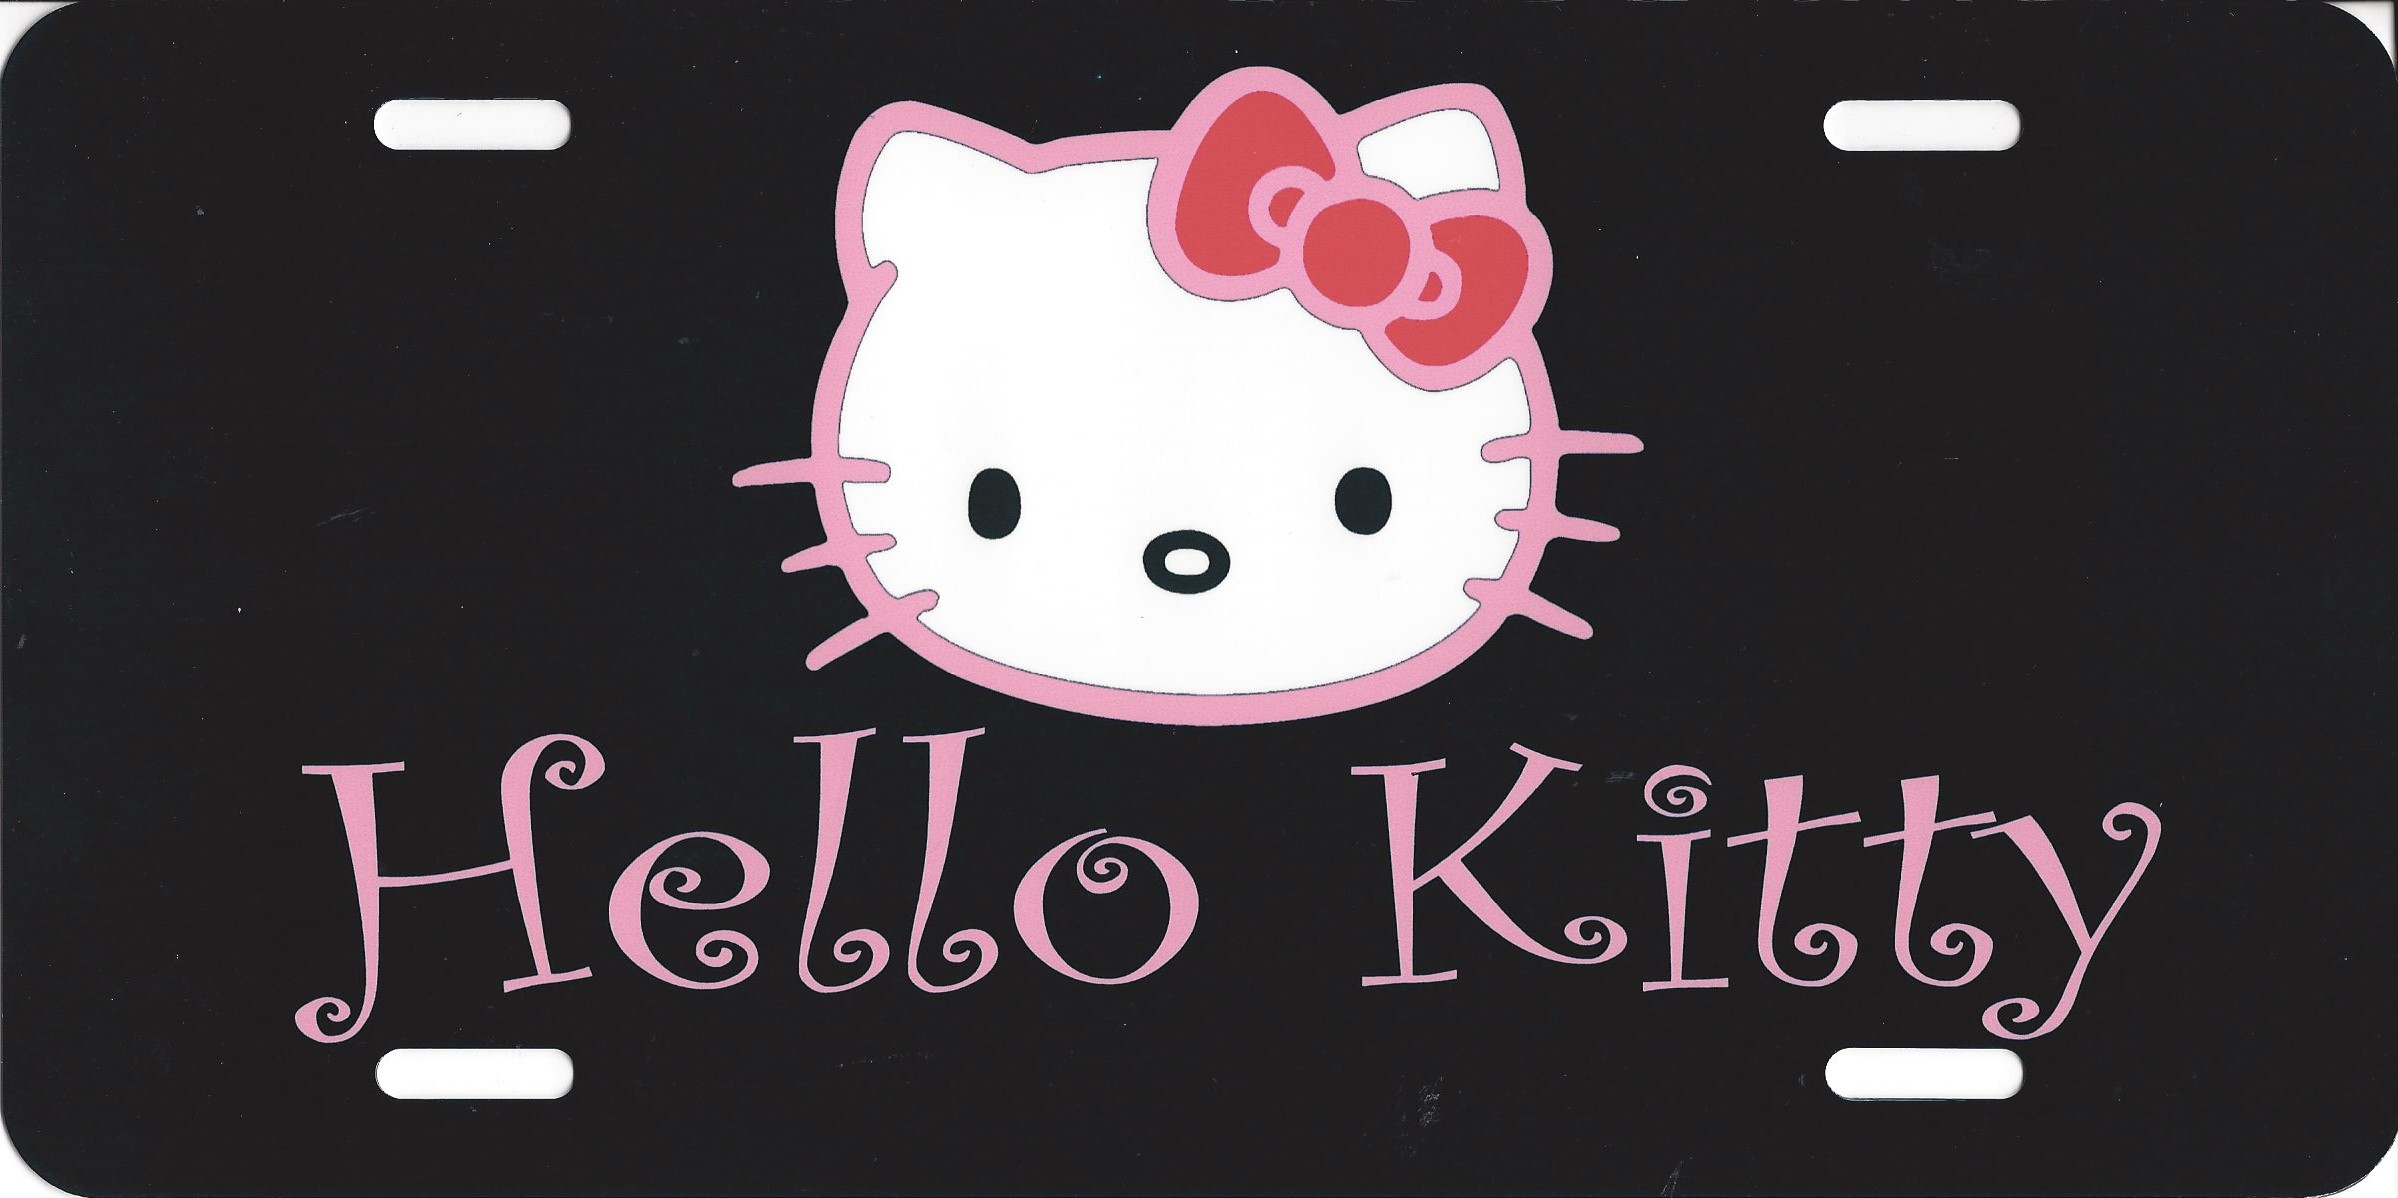 HELLO KITTY Black Photo License Plate